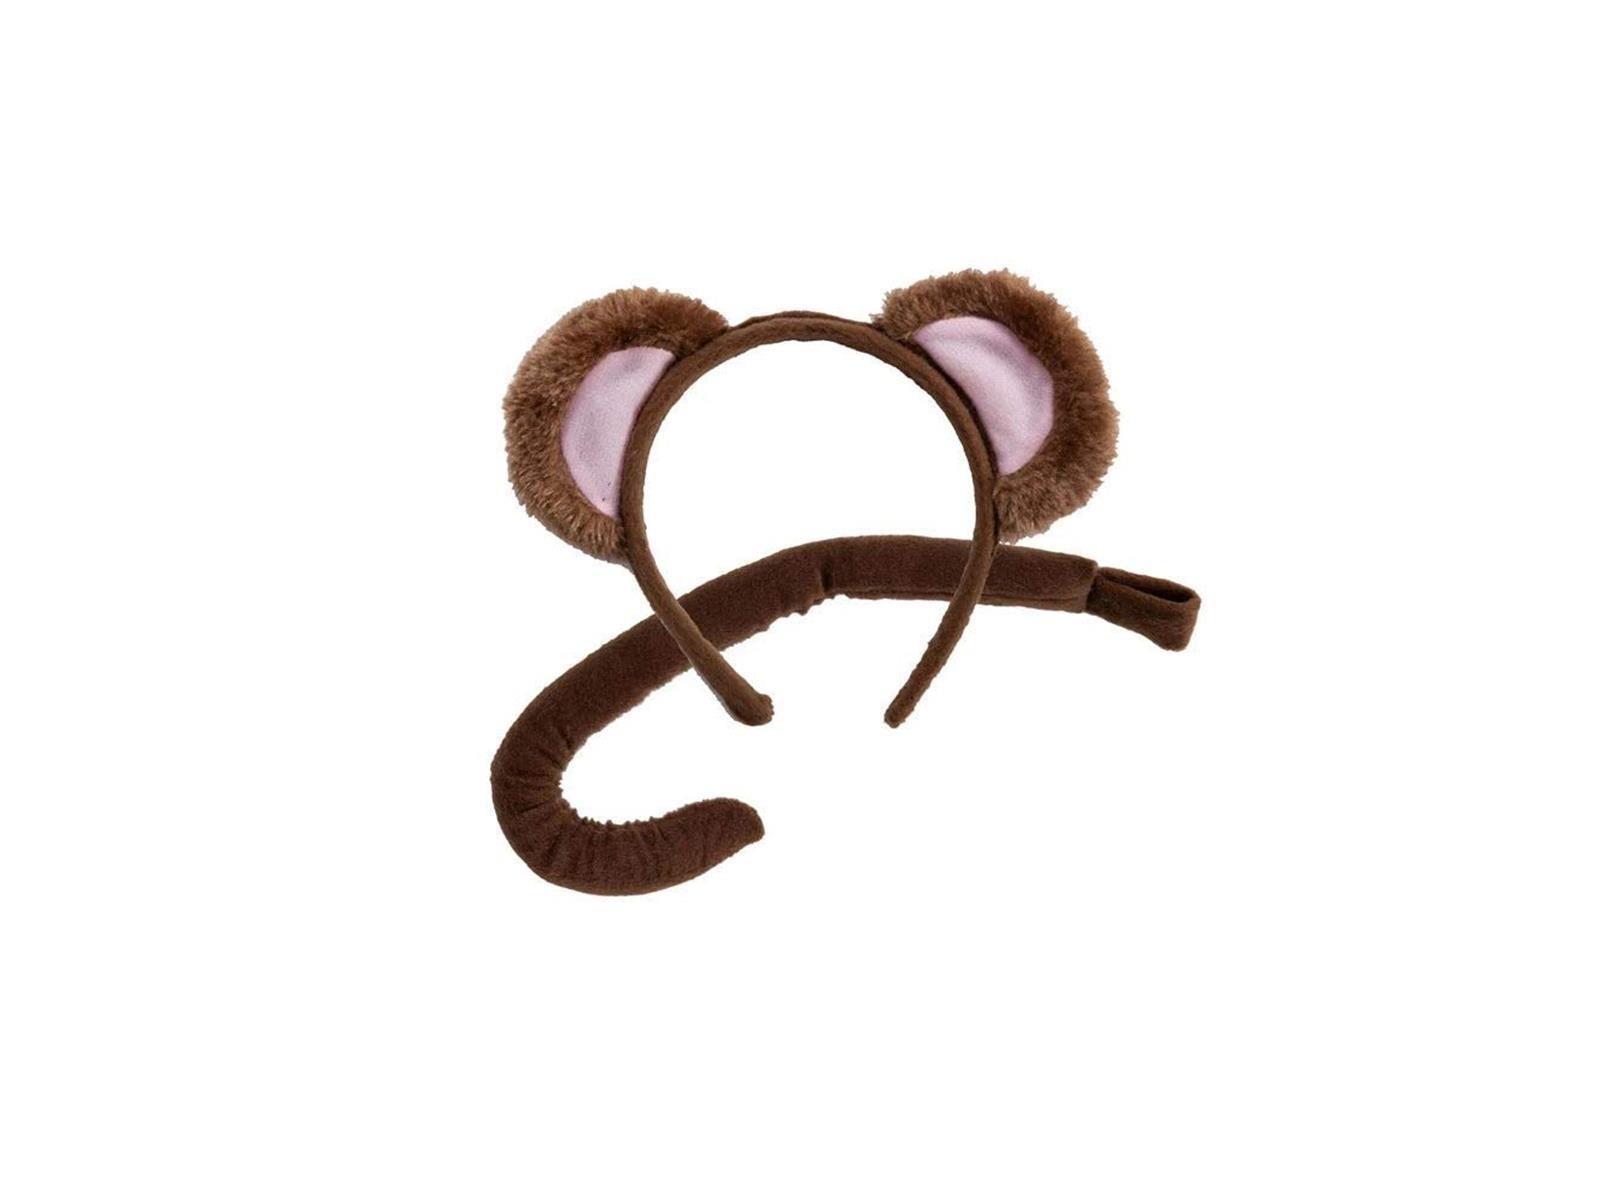 Monkey Eat & Tail Set One Size Adult Fancy Dress Accessory